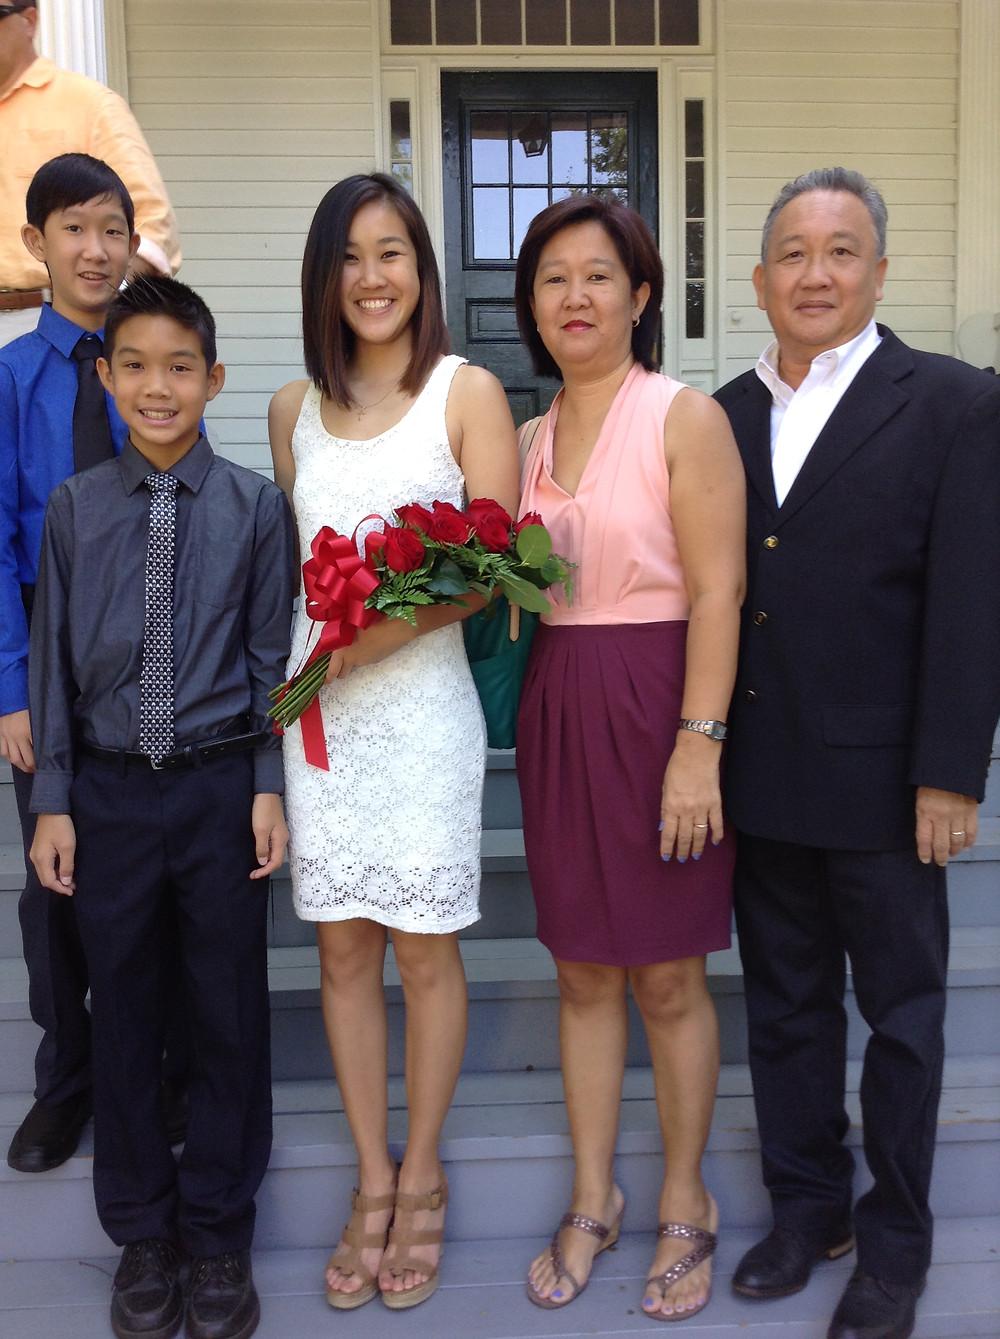 rebecca hugh's graduation.jpg